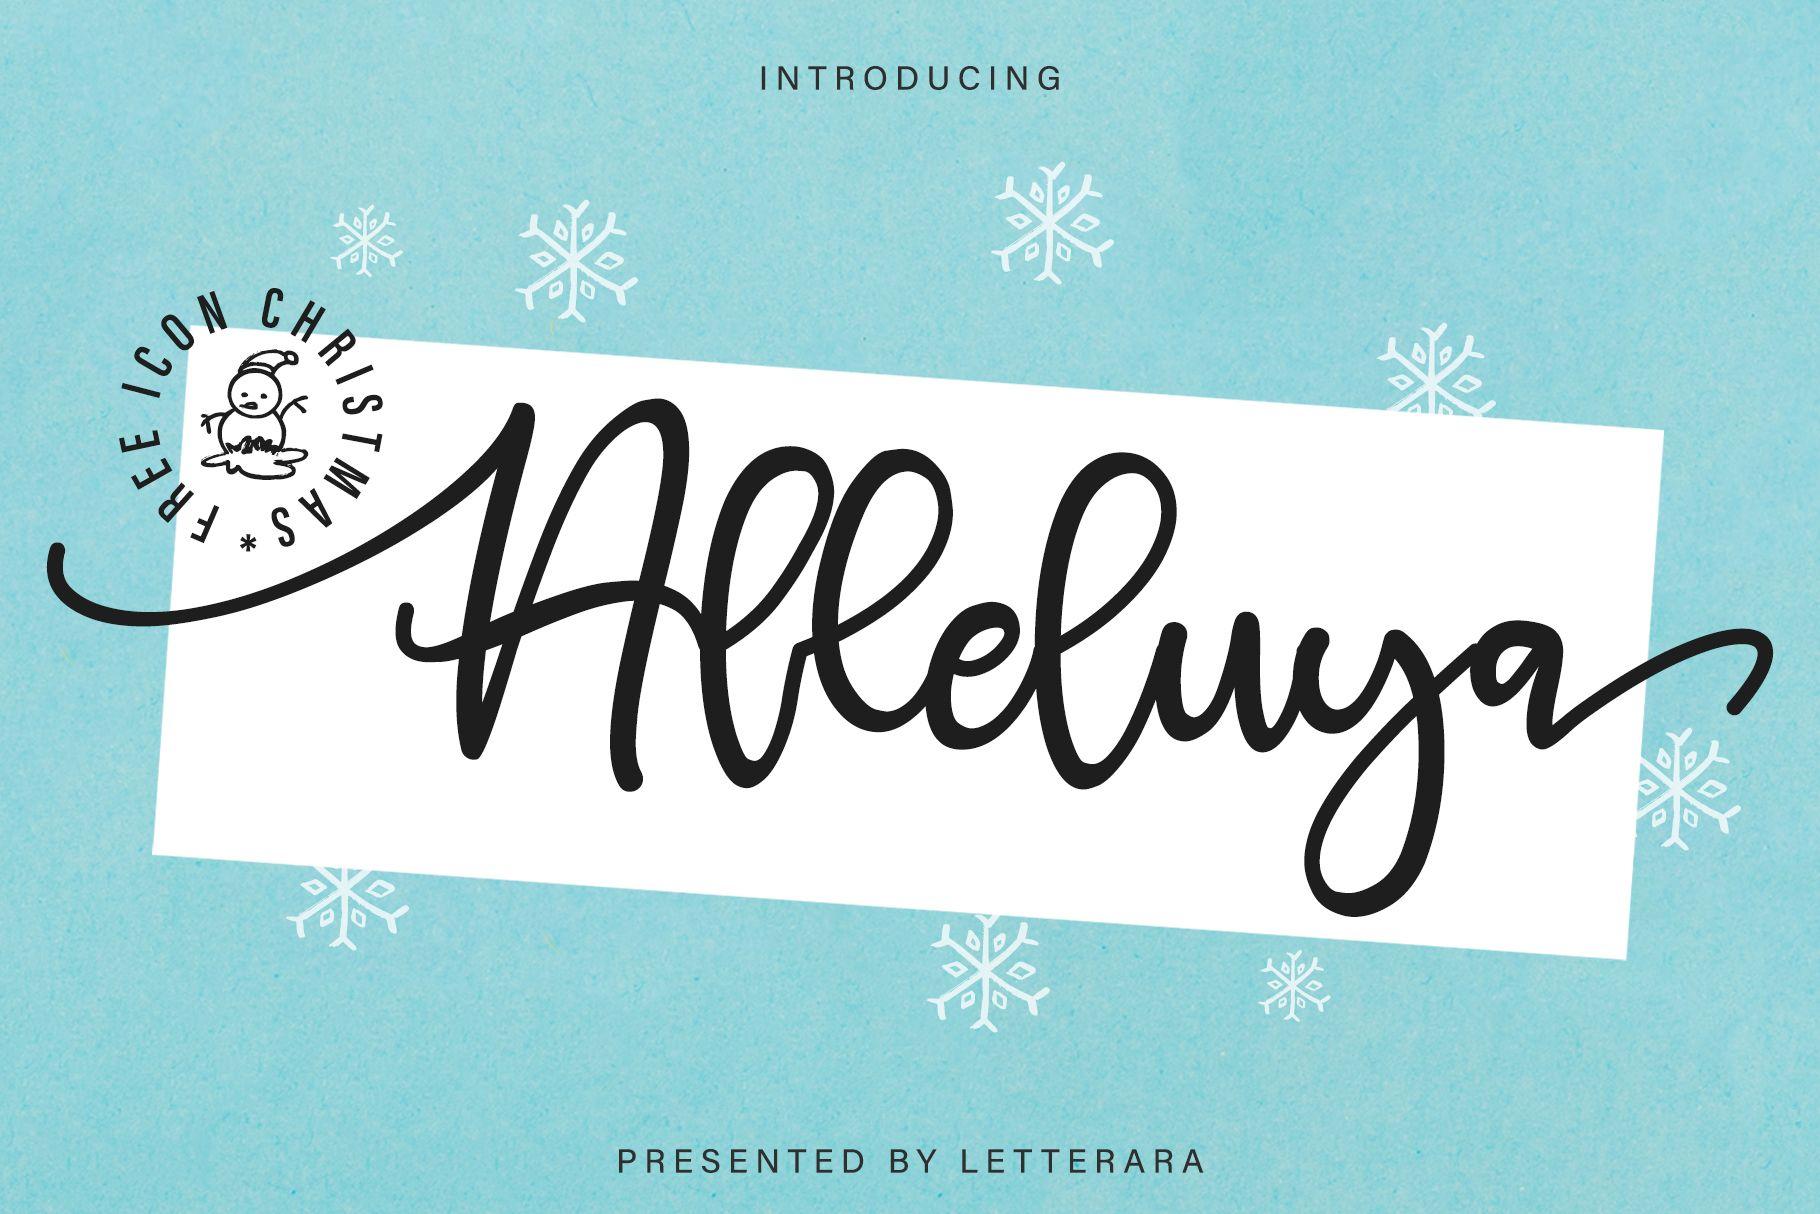 Alleluya Script Font In 2020 Beautiful Fonts Font Bundles Commercial Use Fonts